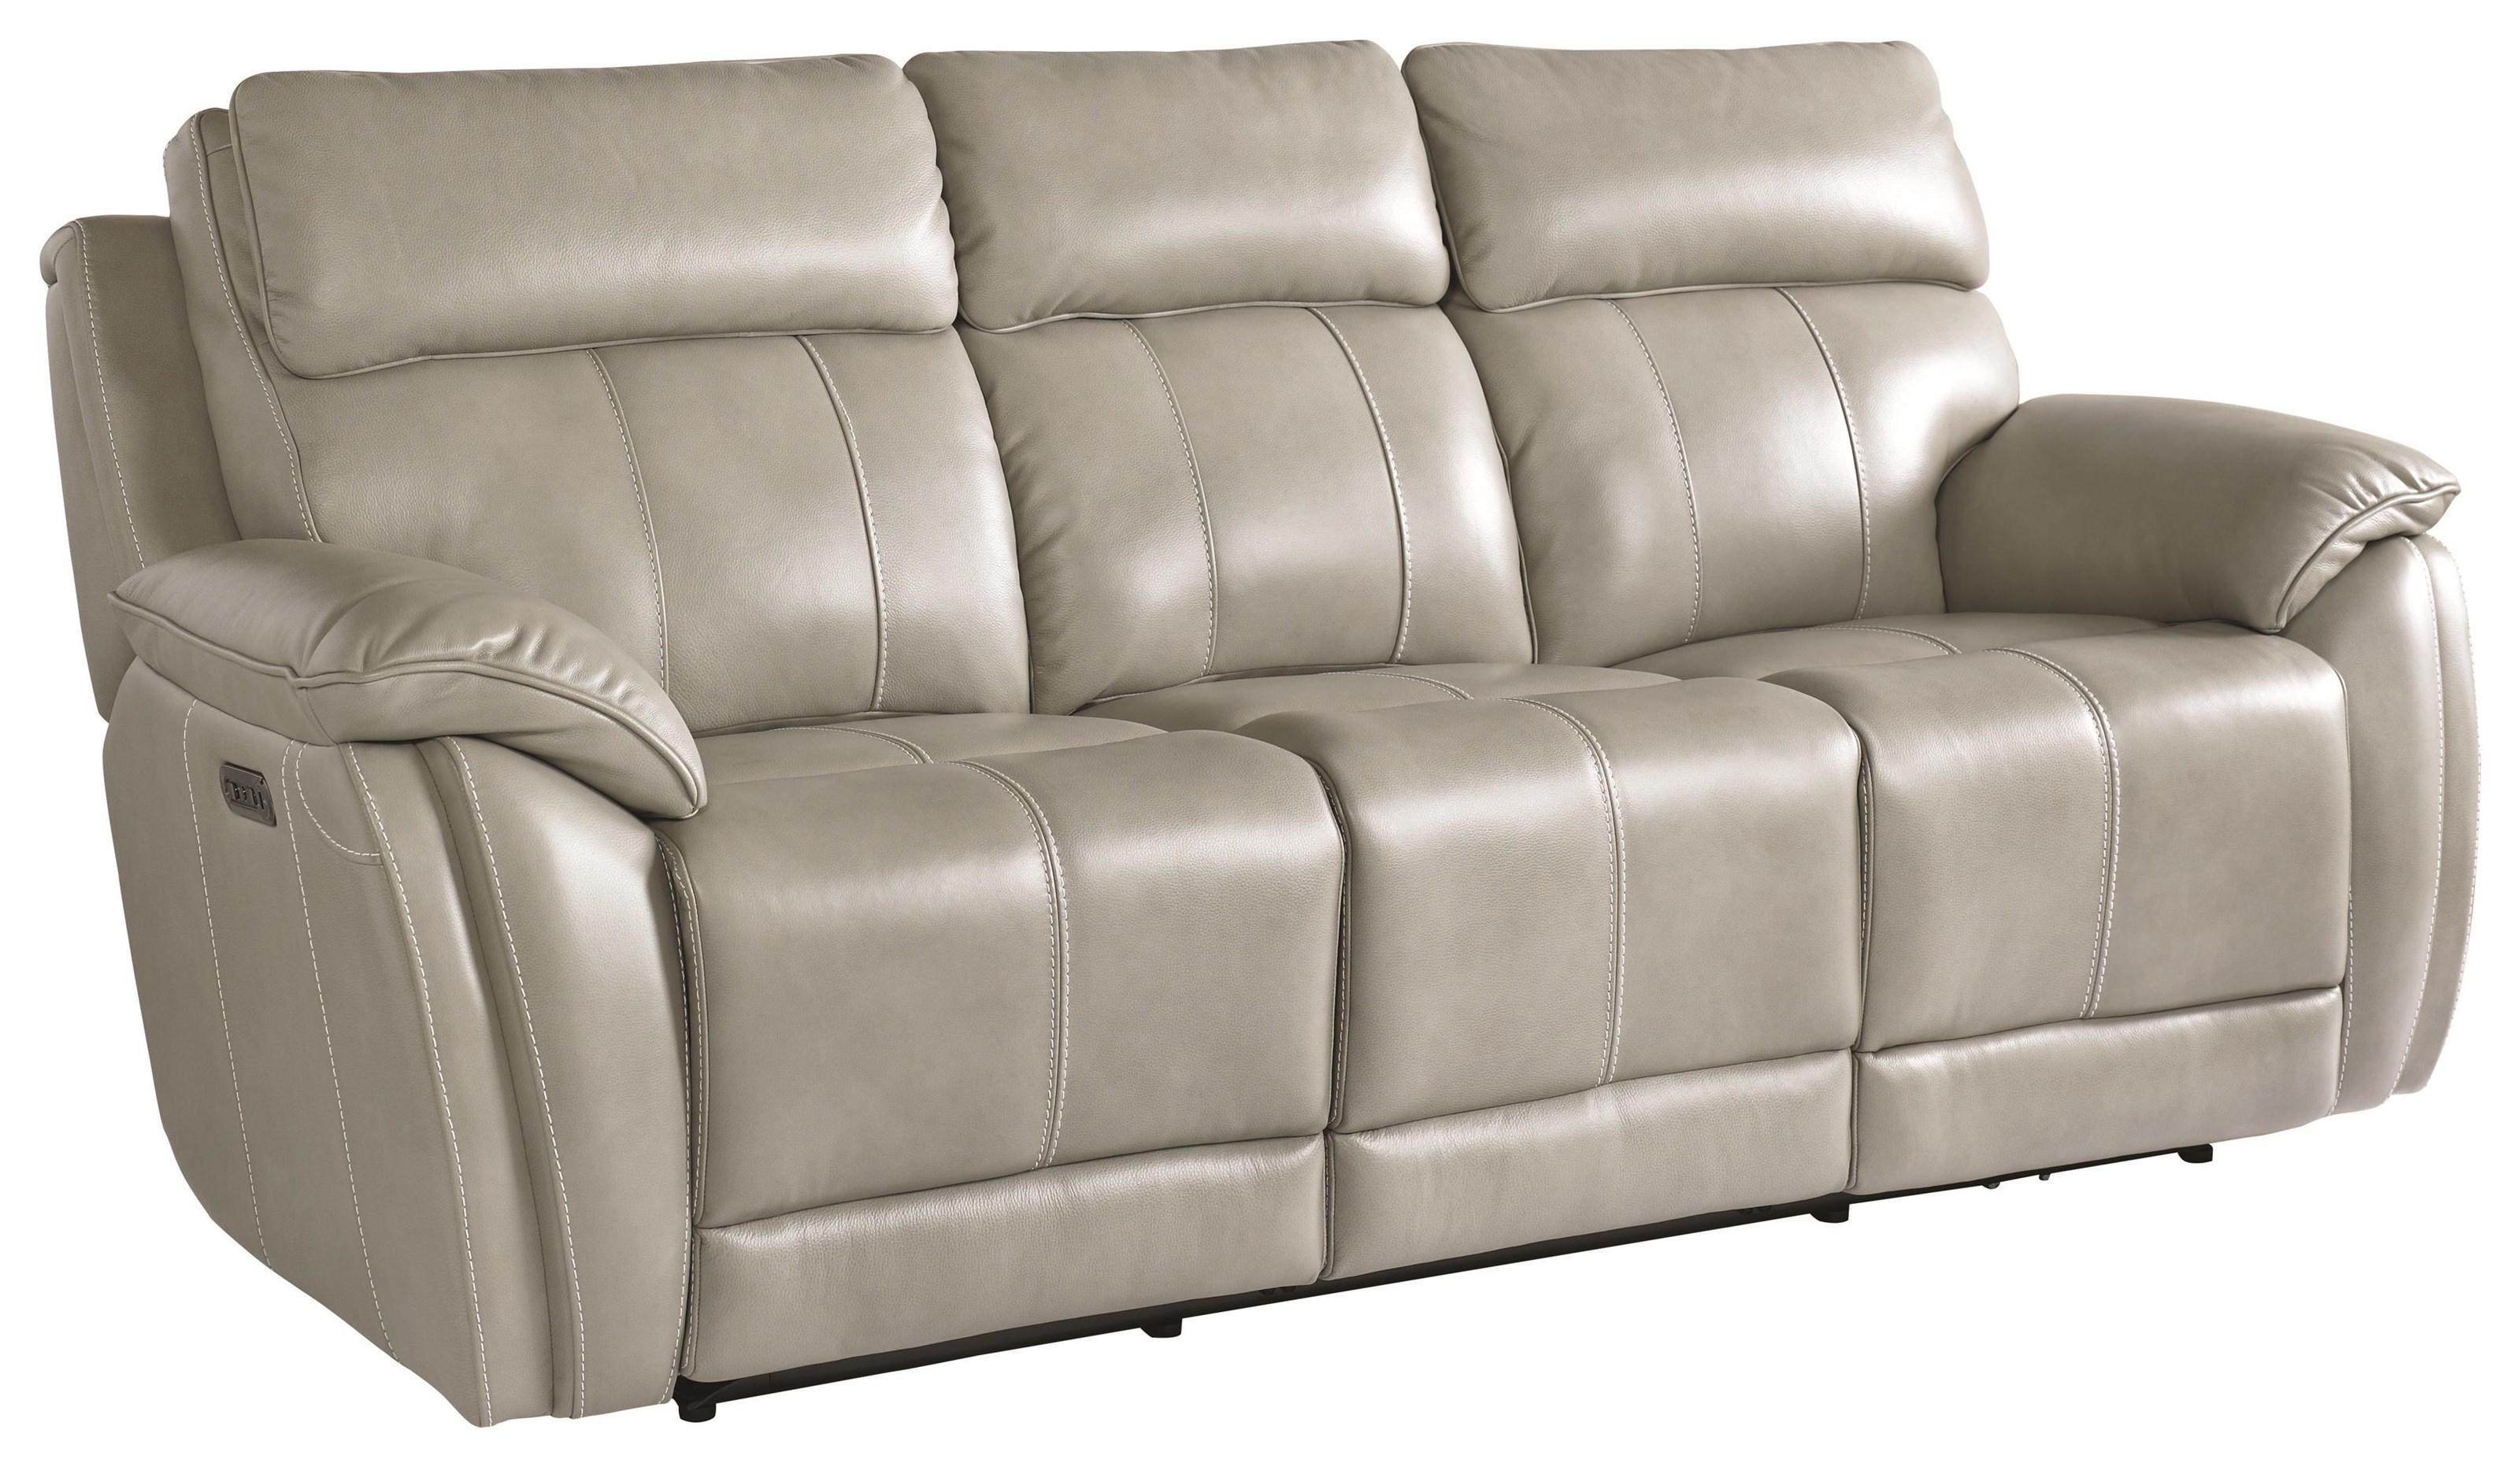 Levitate Power Sofa by Bassett at Johnny Janosik